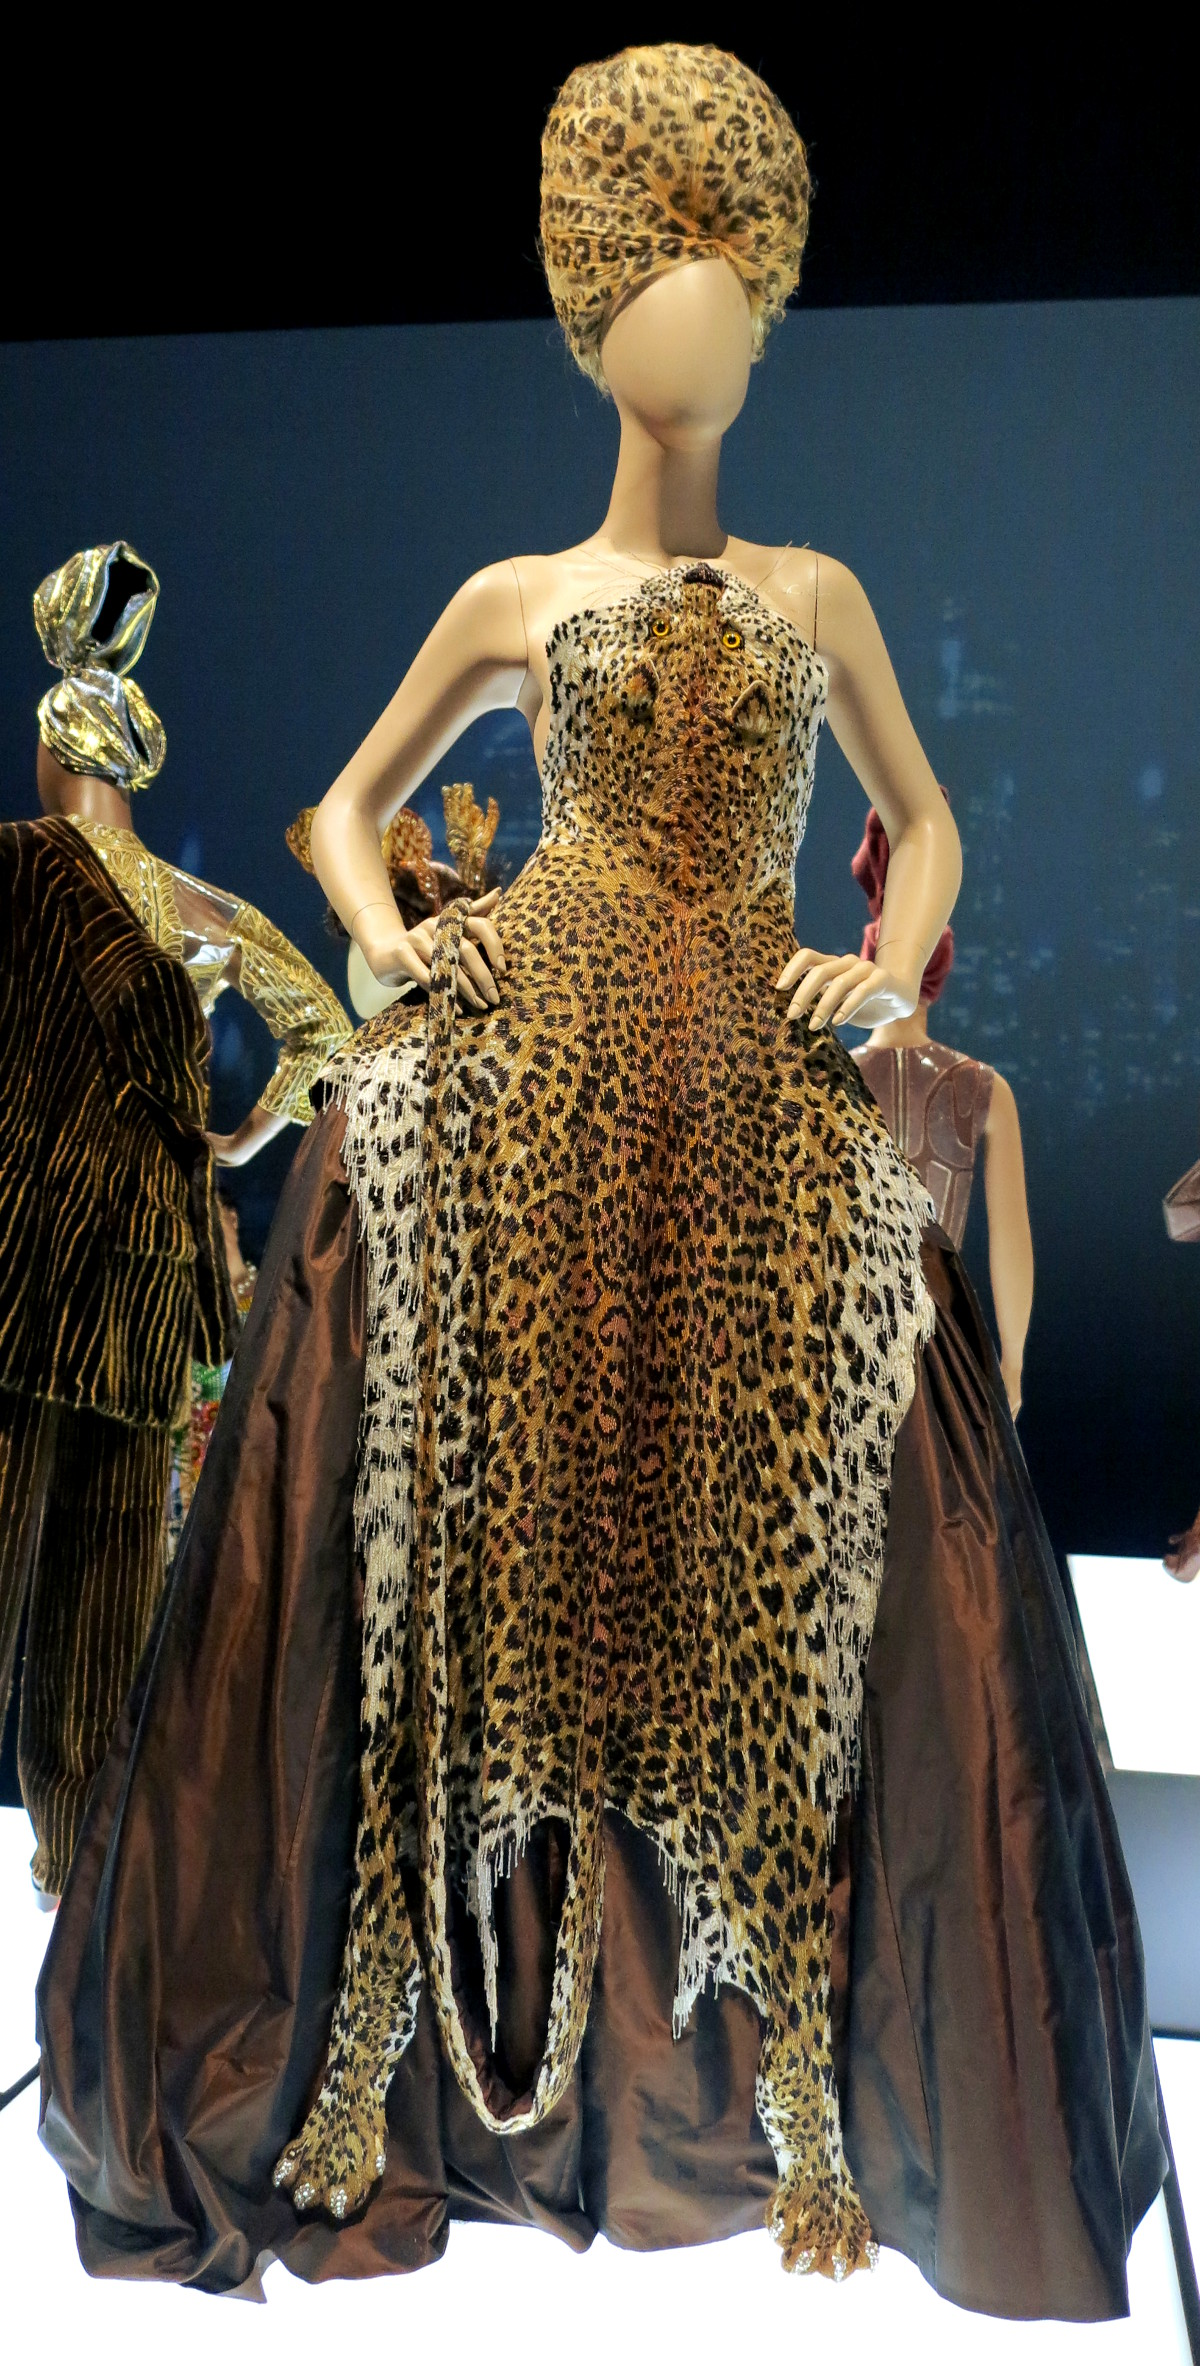 Leopard dress Jean Paul Gaultier National Gallery of Victoria